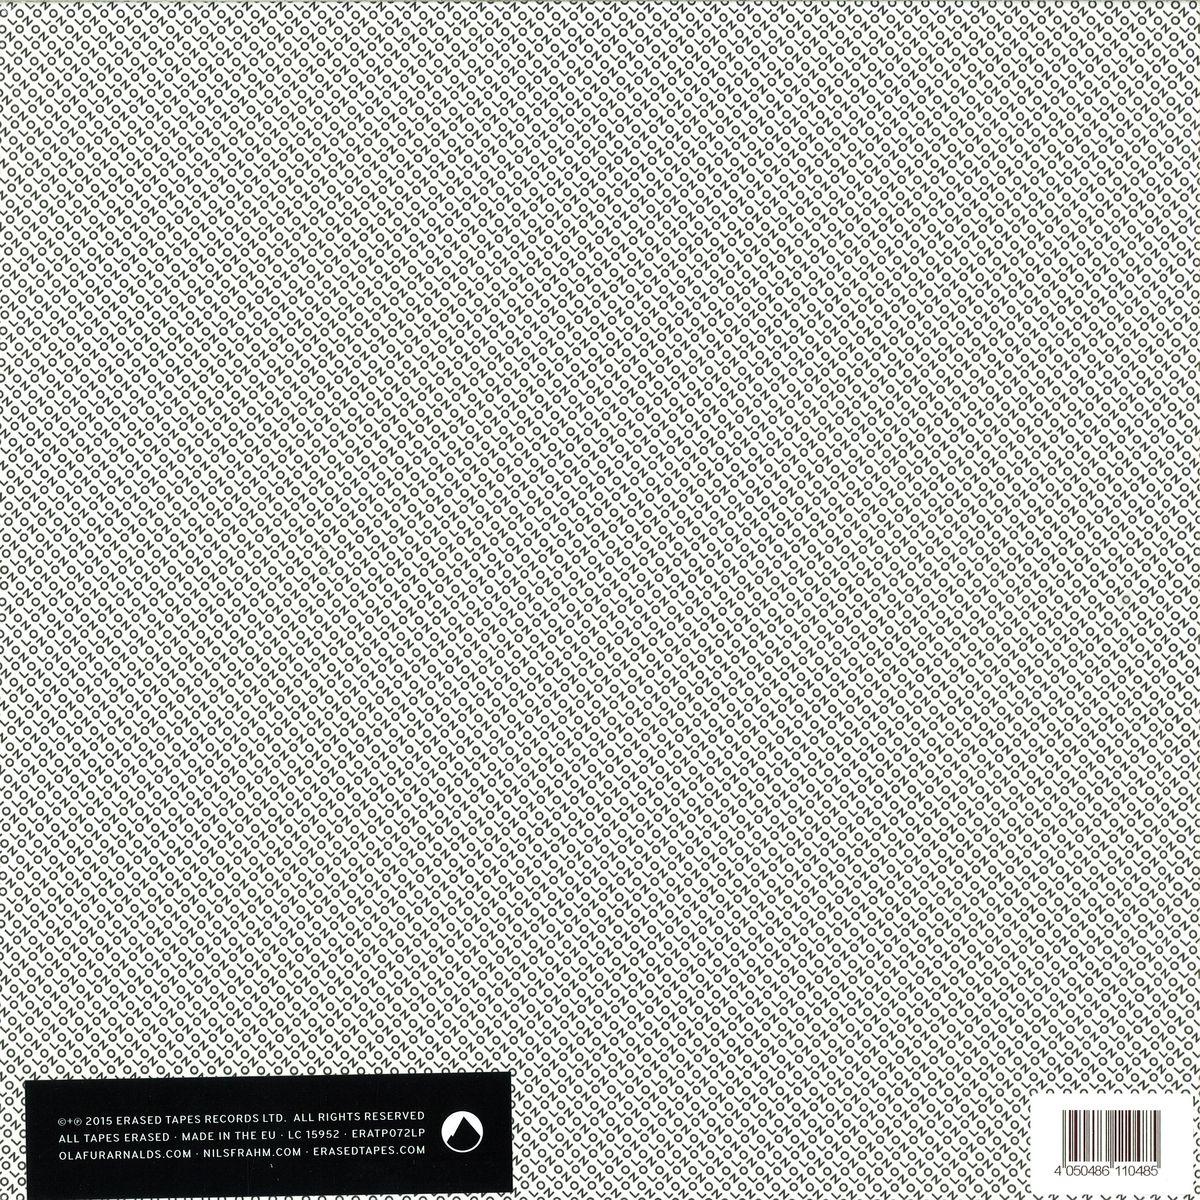 211 Lafur Arnalds Amp Nils Frahm Loon Erased Tapes